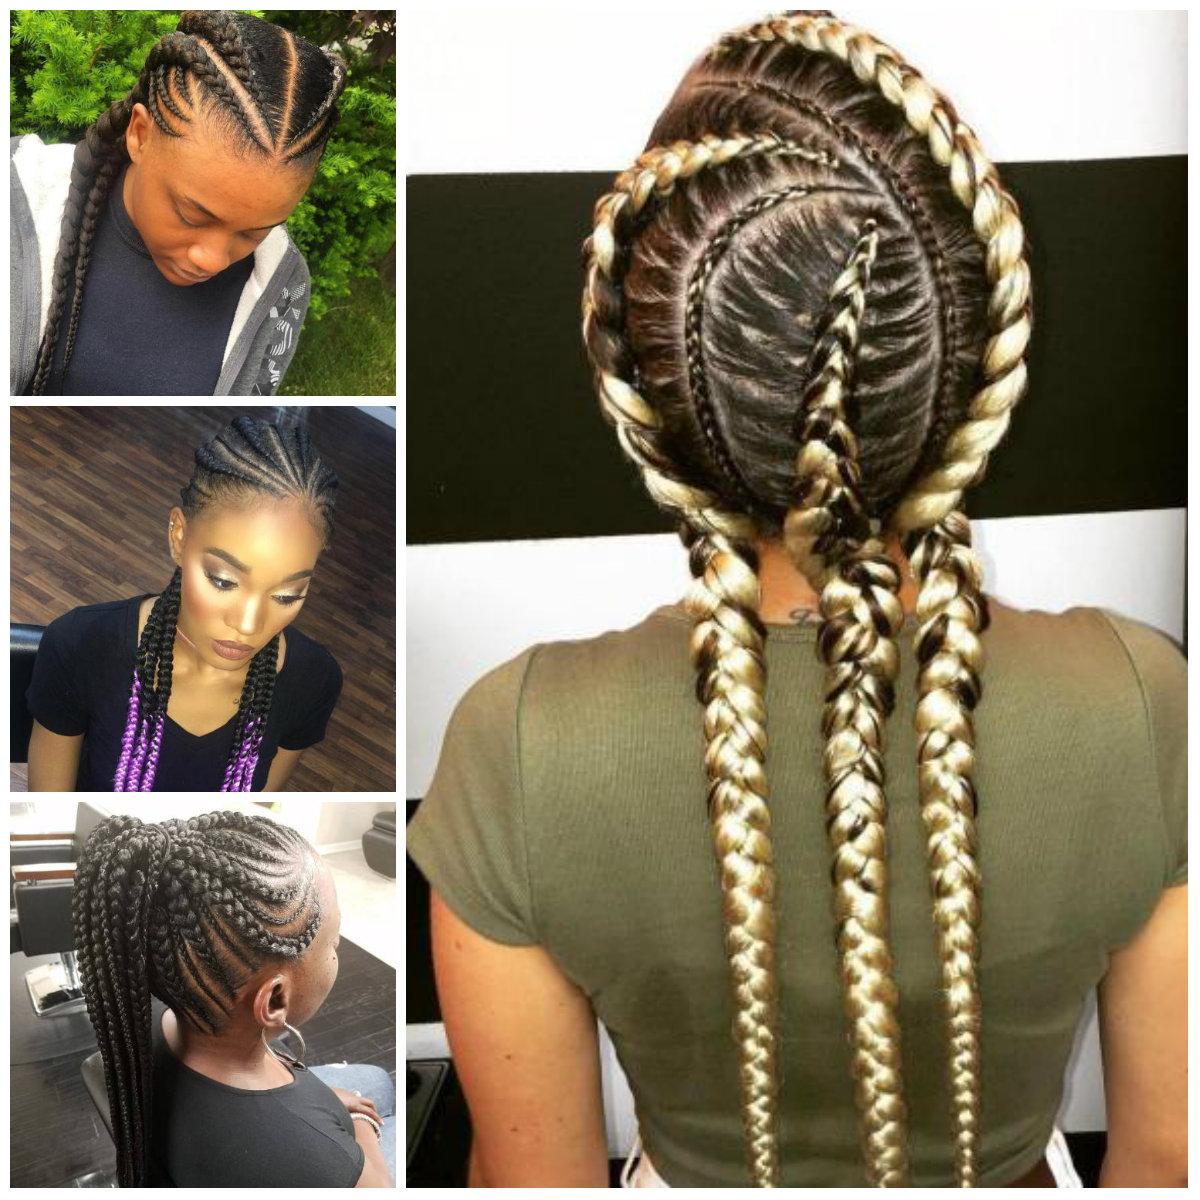 Chic Ghana Braids for 2017